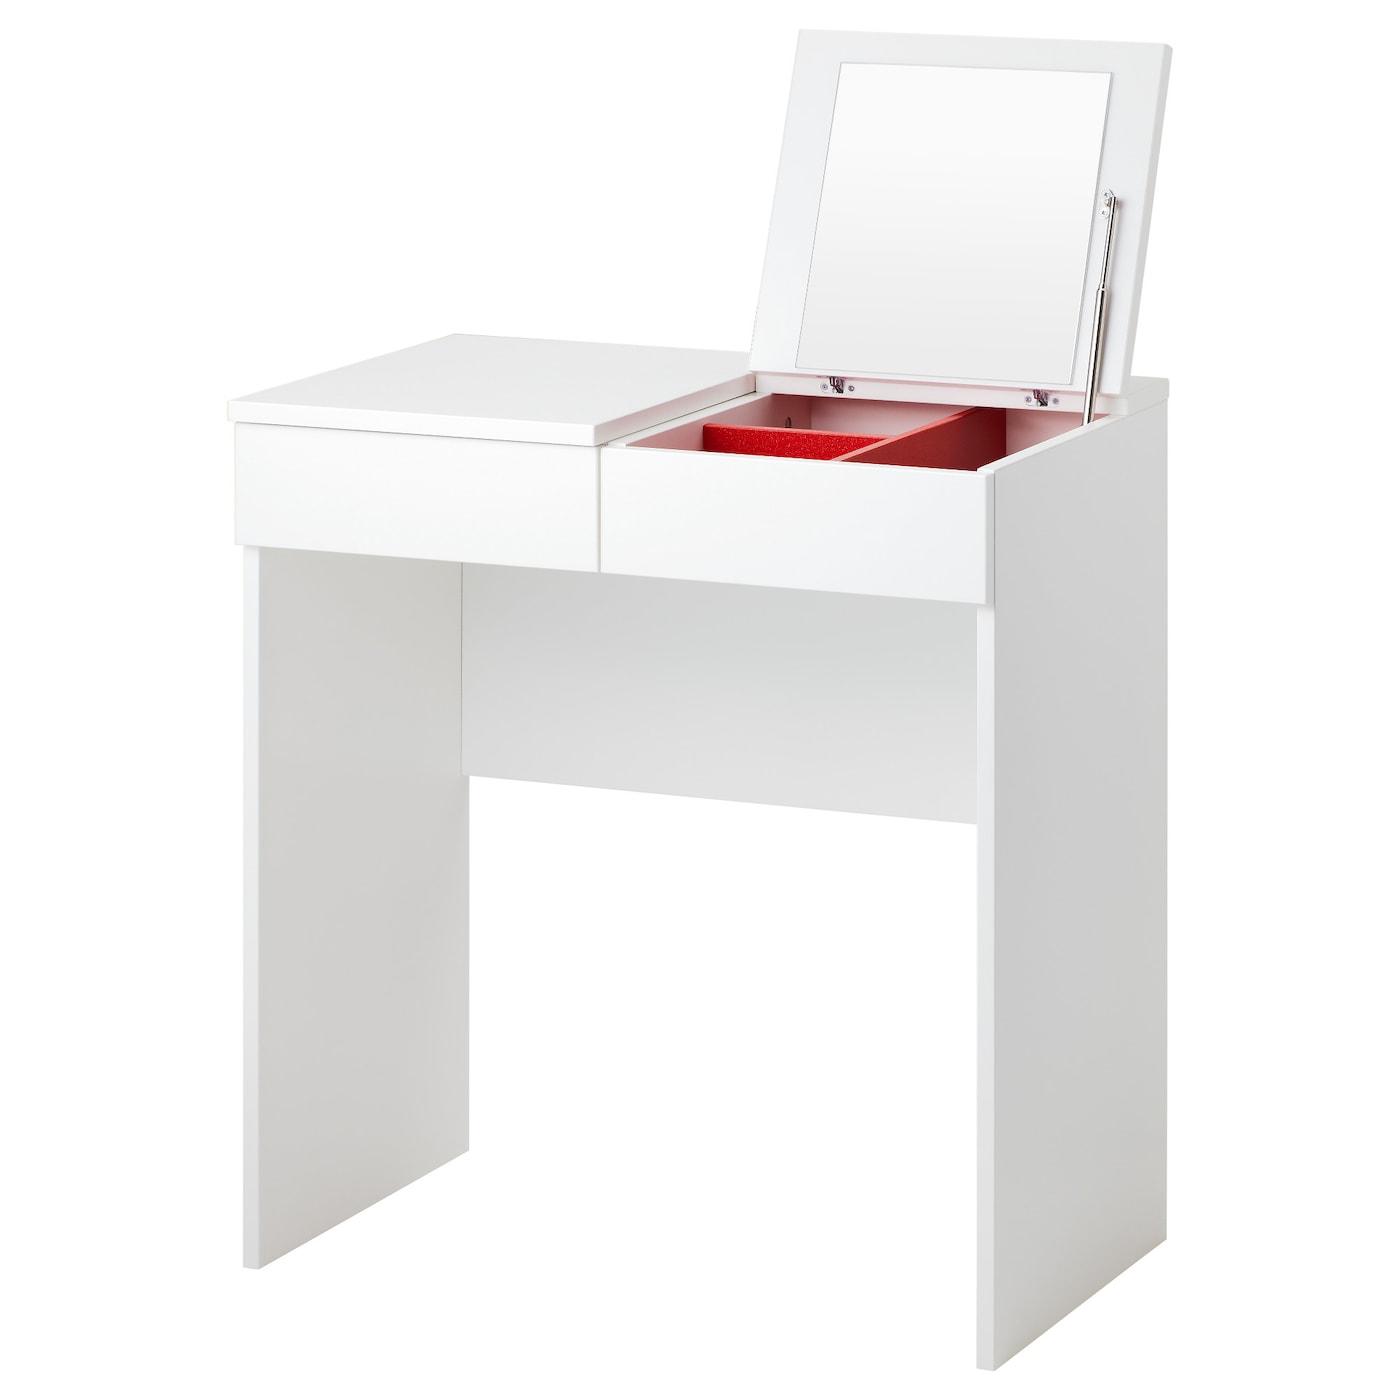 brimnes dressing table white 70 x 42 cm ikea. Black Bedroom Furniture Sets. Home Design Ideas